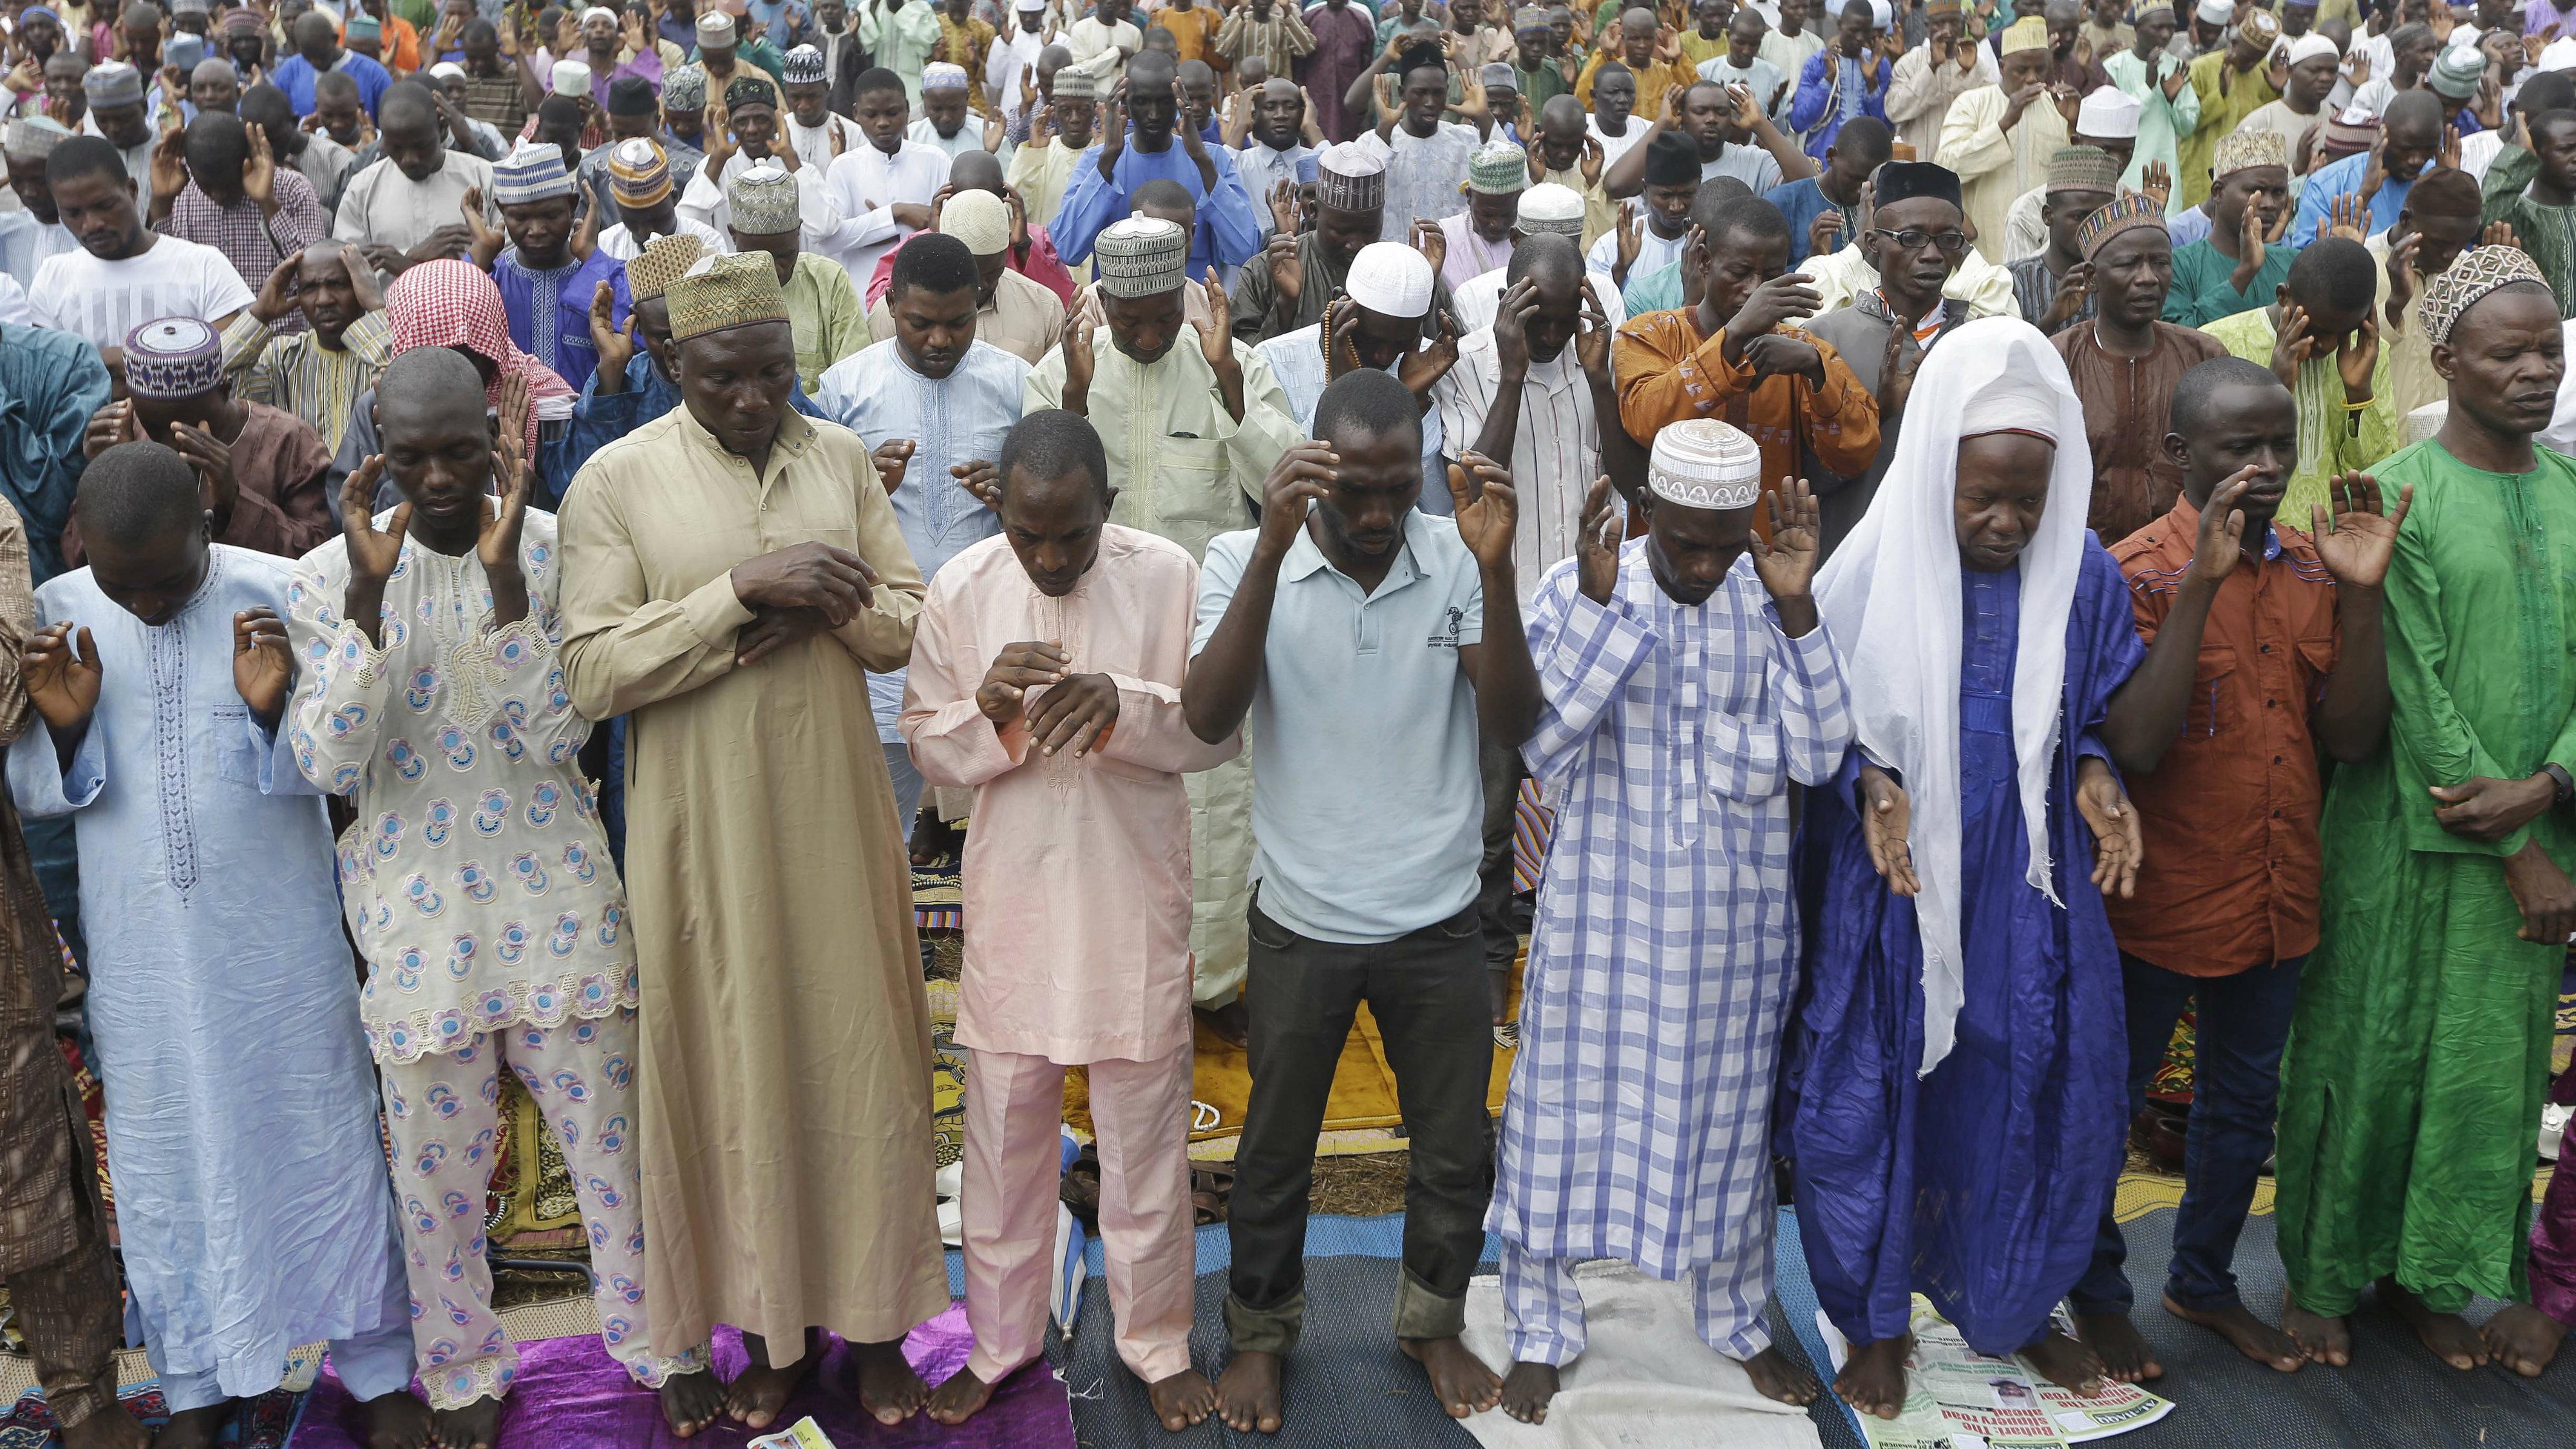 Nigeria Muslims attend Eid al-Fitr prayer in Lagos, Nigeria, Friday July 17, 2015, marking the end of the Muslim holy fasting month of Ramadan. (AP Photo/Sunday Alamba)